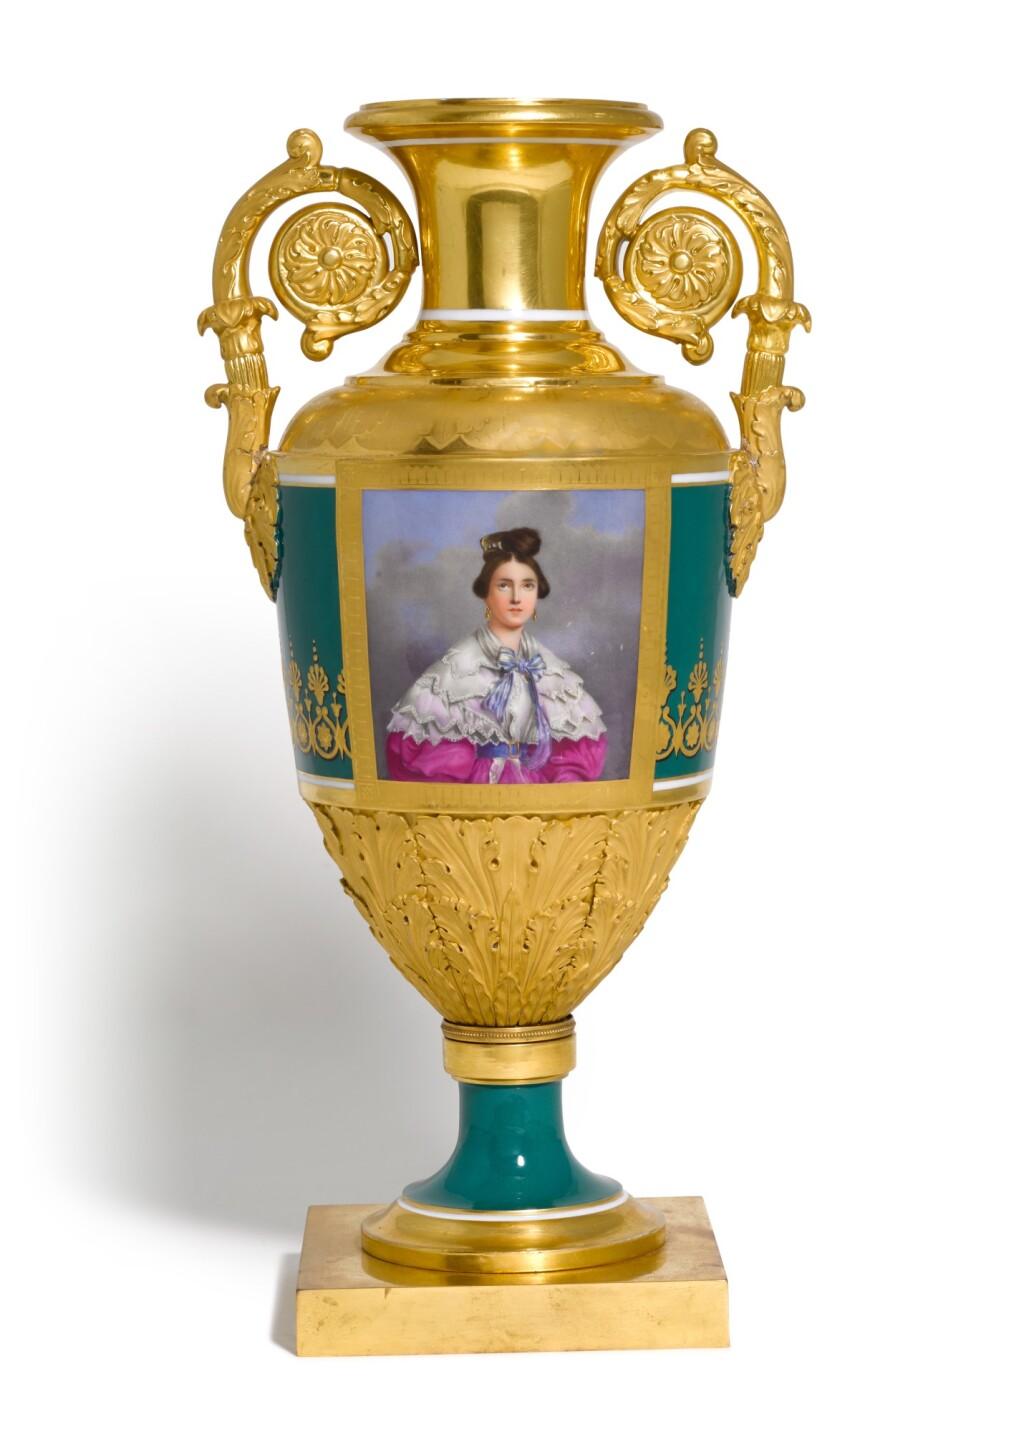 A RARE IMPERIAL PORCELAIN VASE, IMPERIAL PORCELAIN MANUFACTORY, ST PETERSBURG, PERIOD OF NICHOLAS I (1825-1855)